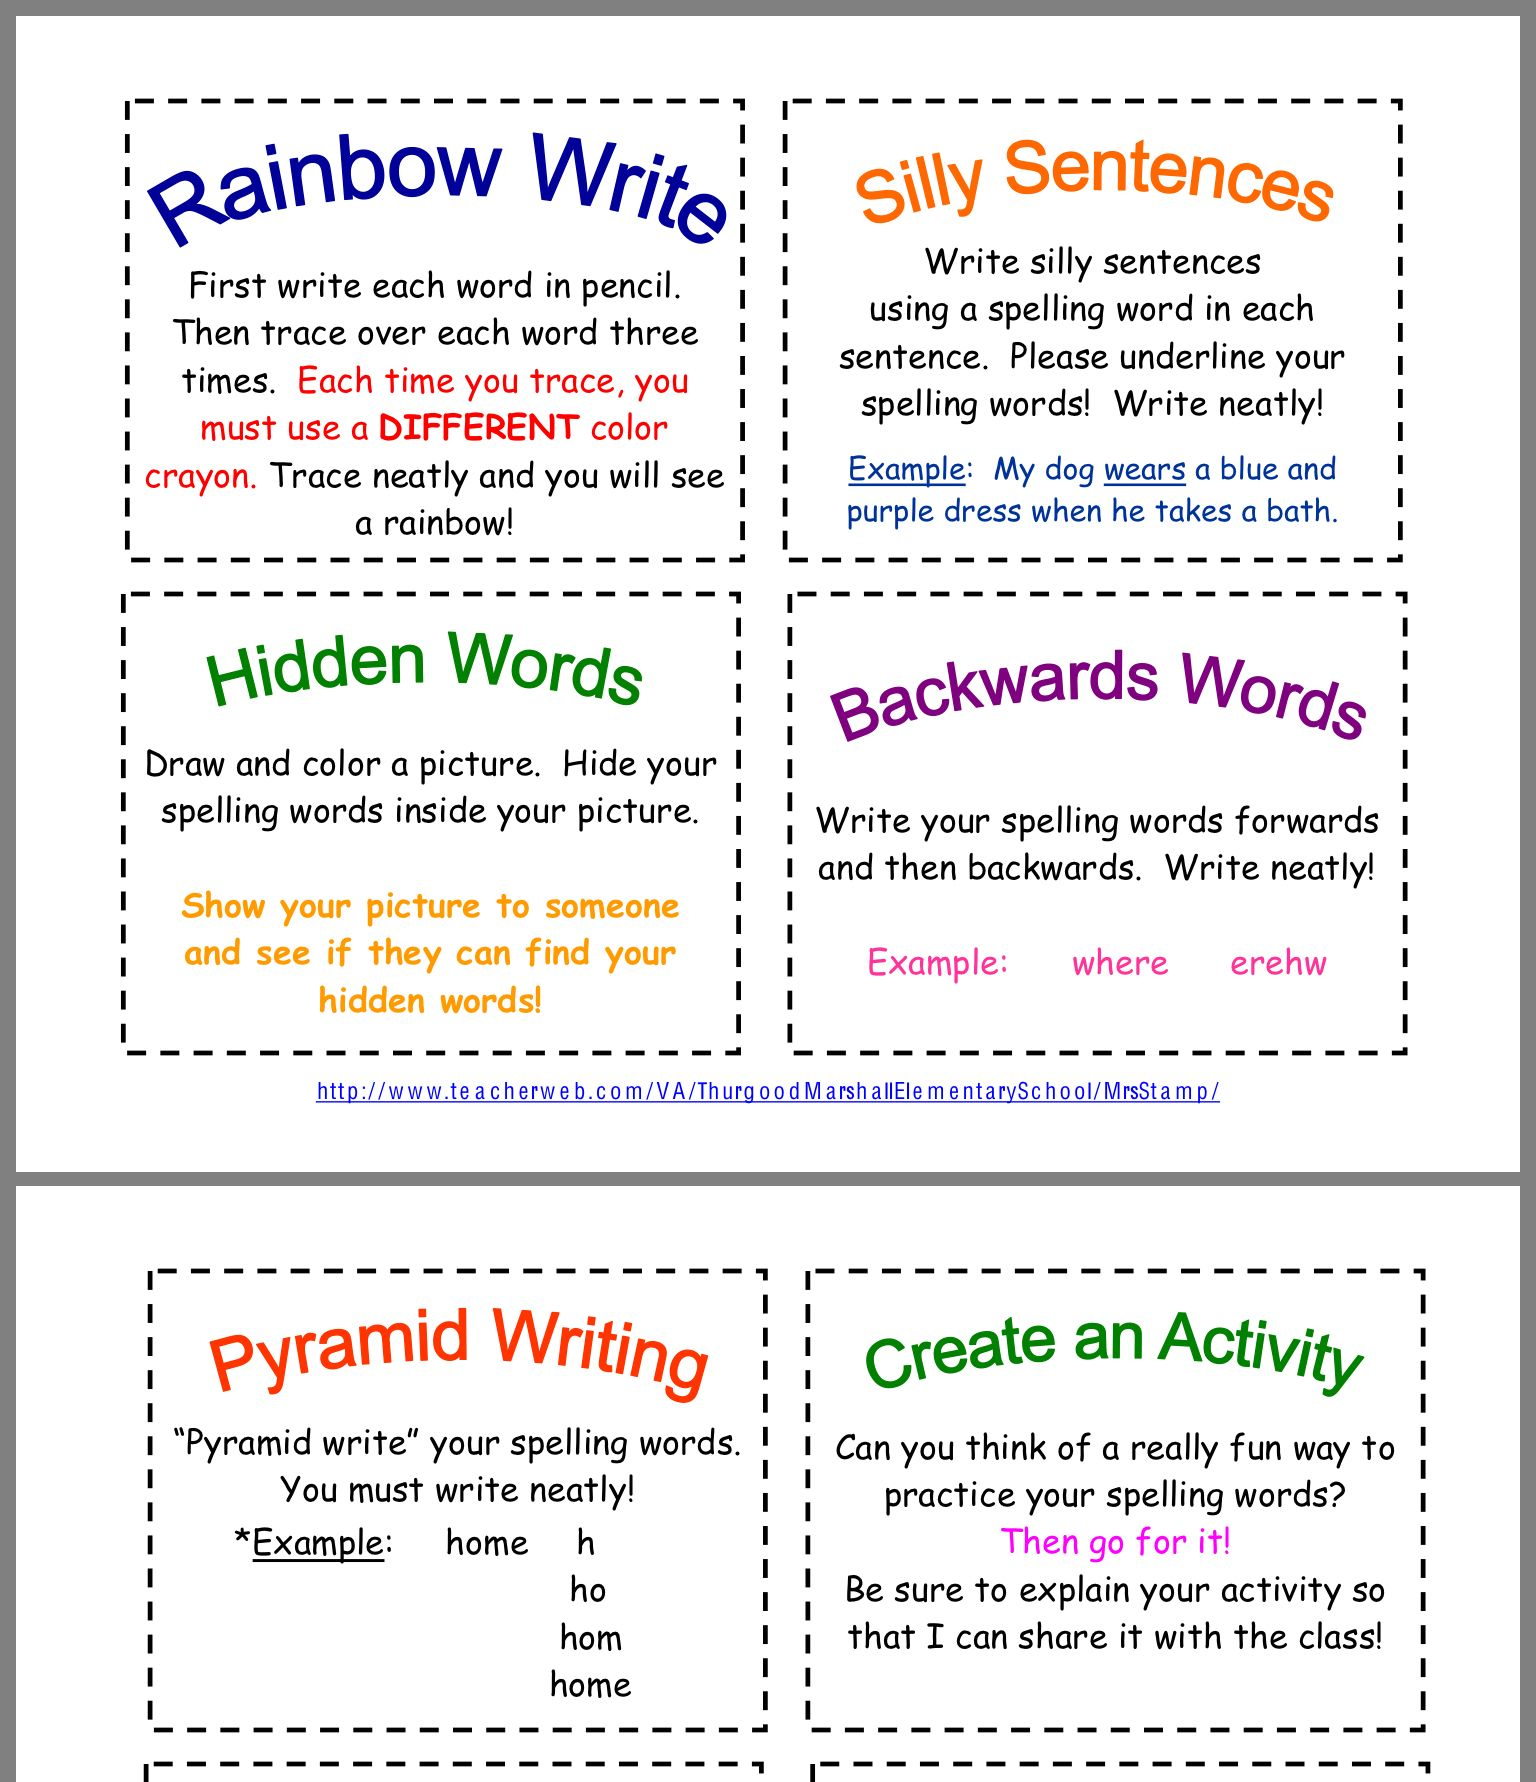 Pin By Lynnmarie Munroe On School Spelling Words Silly Sentences Rainbow Writing [ 1782 x 1536 Pixel ]